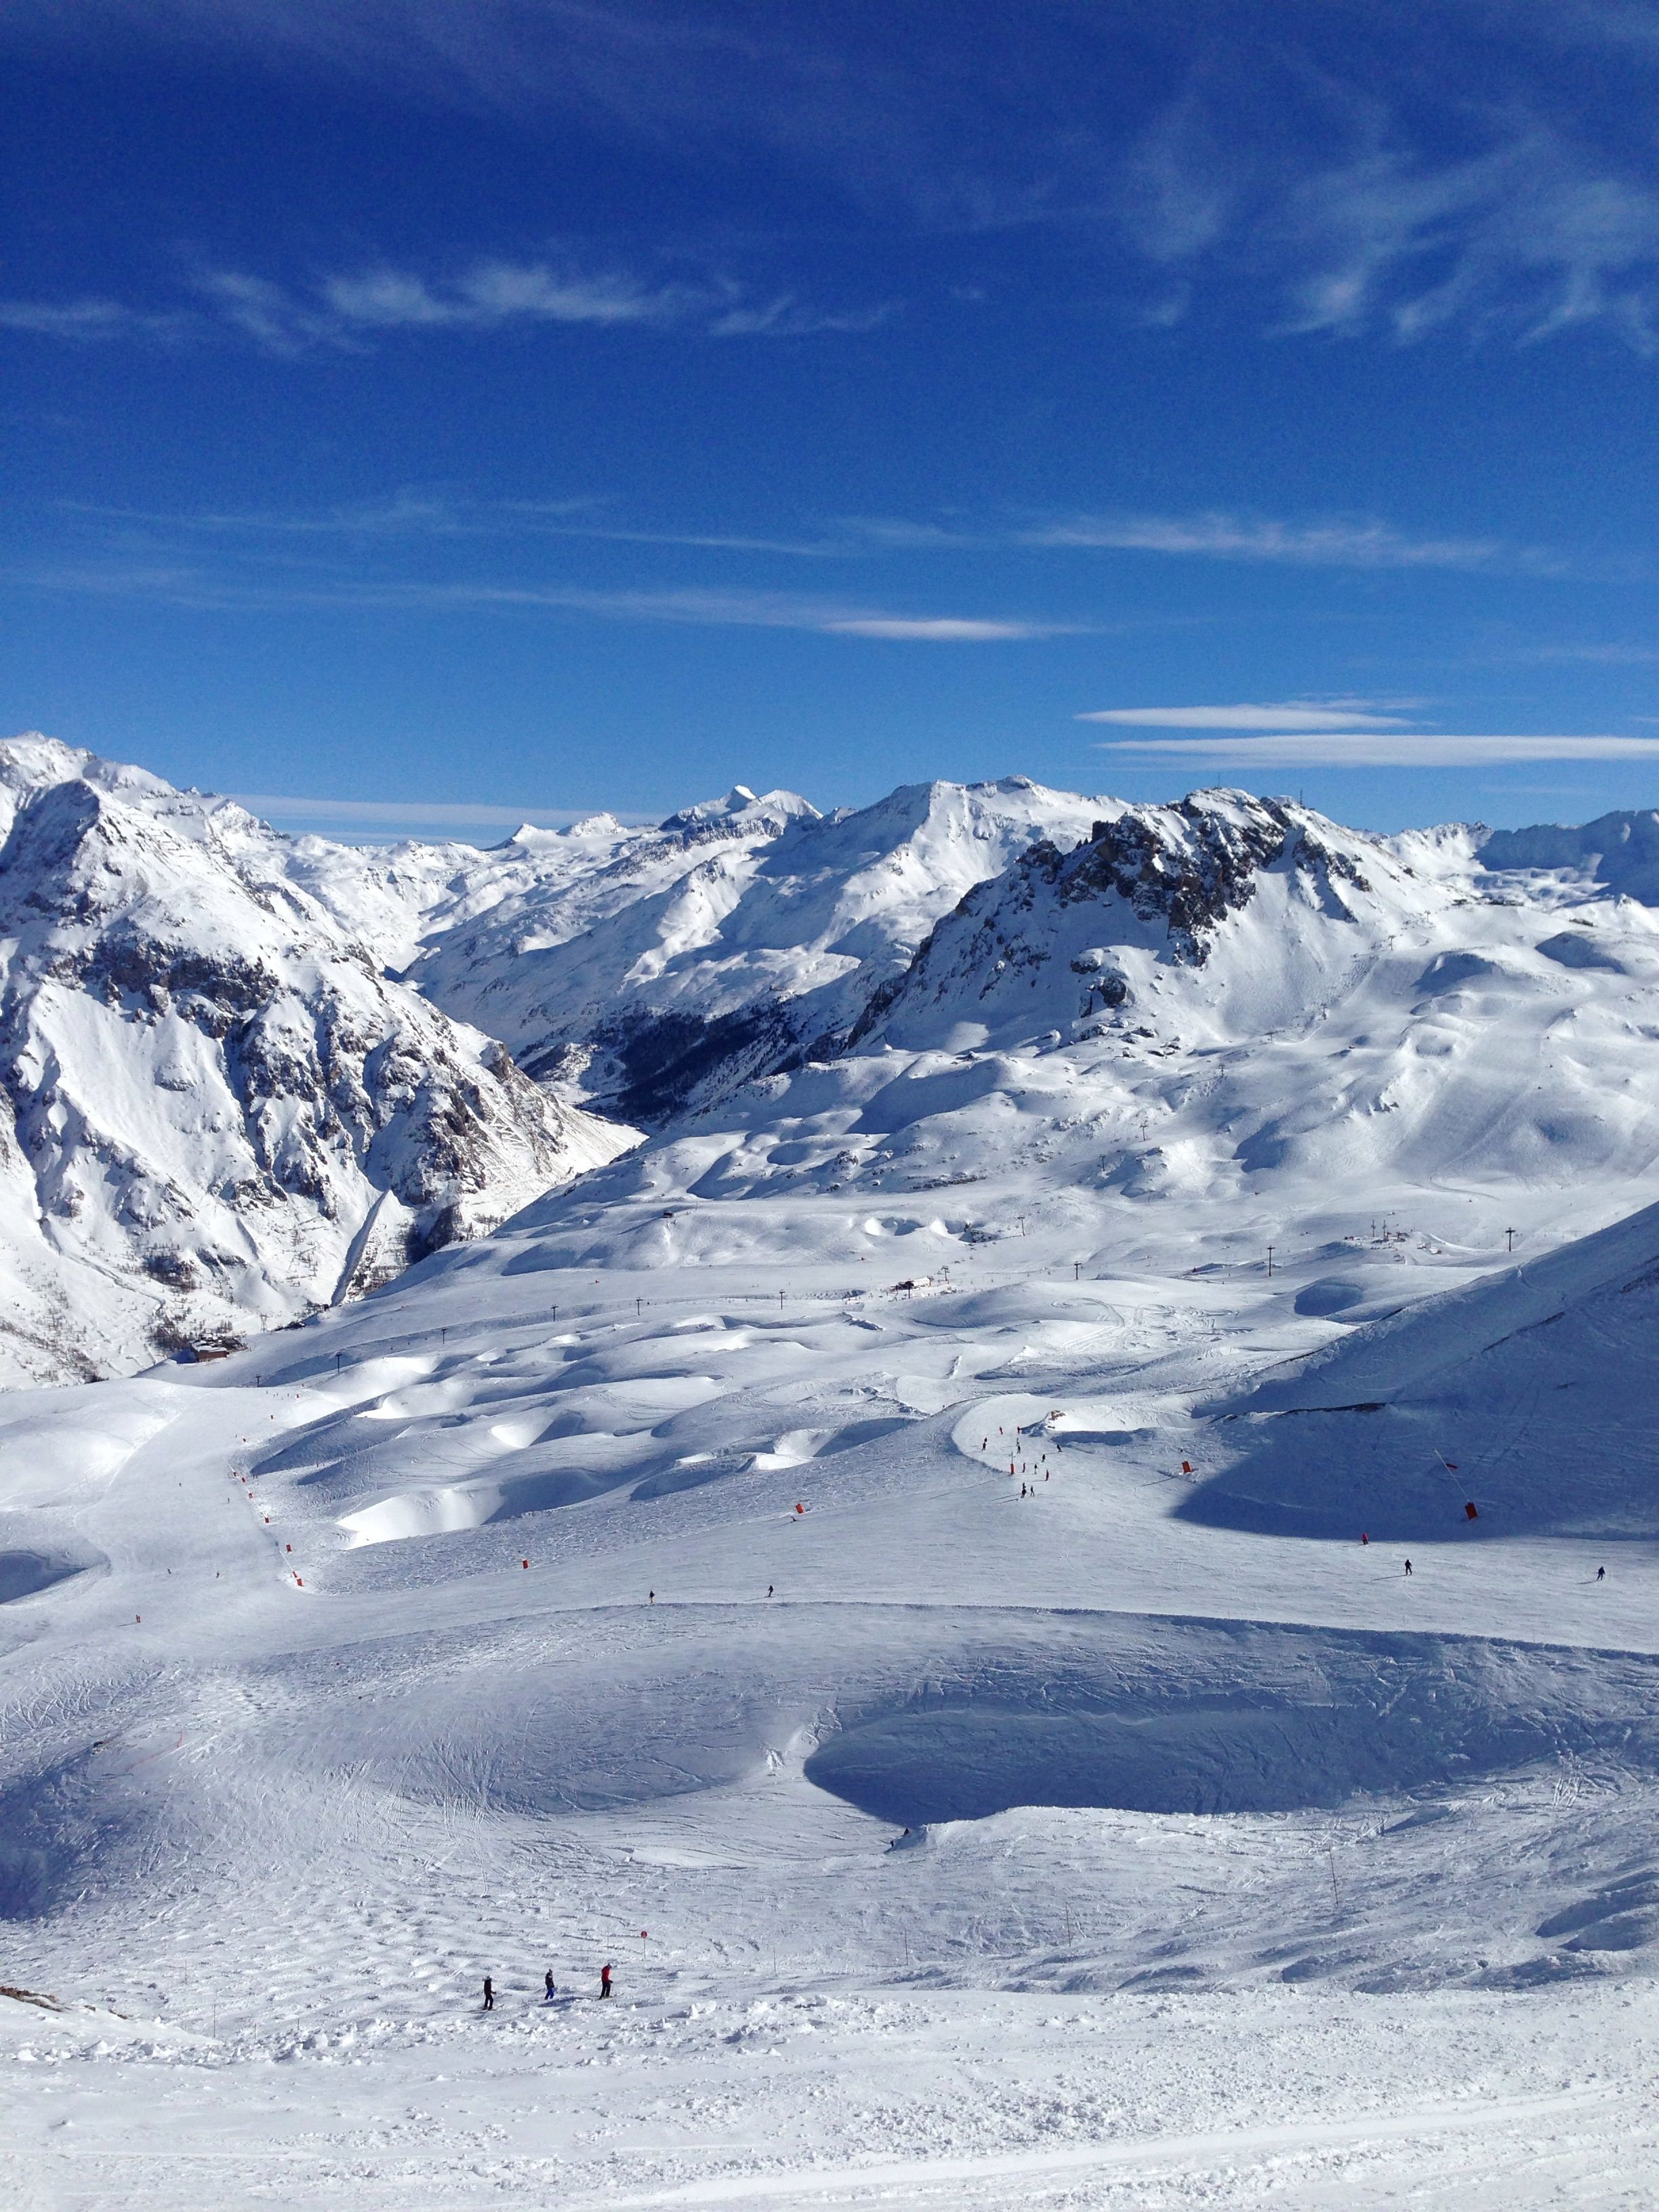 Tignes Val dIsere France Winter wallpaper Skiing Travel 2448x3264